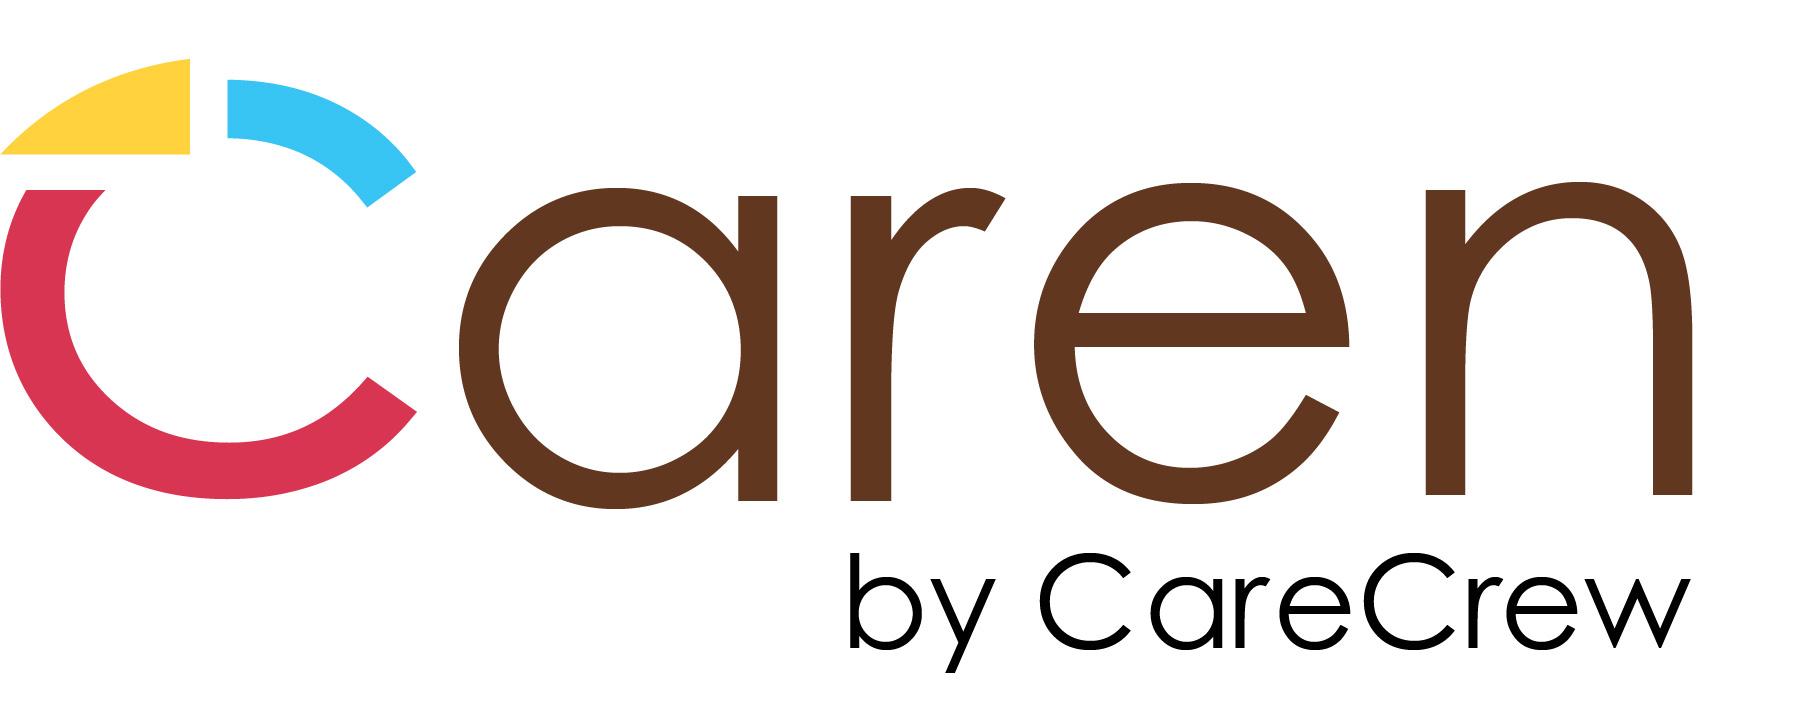 Download Caren Logo